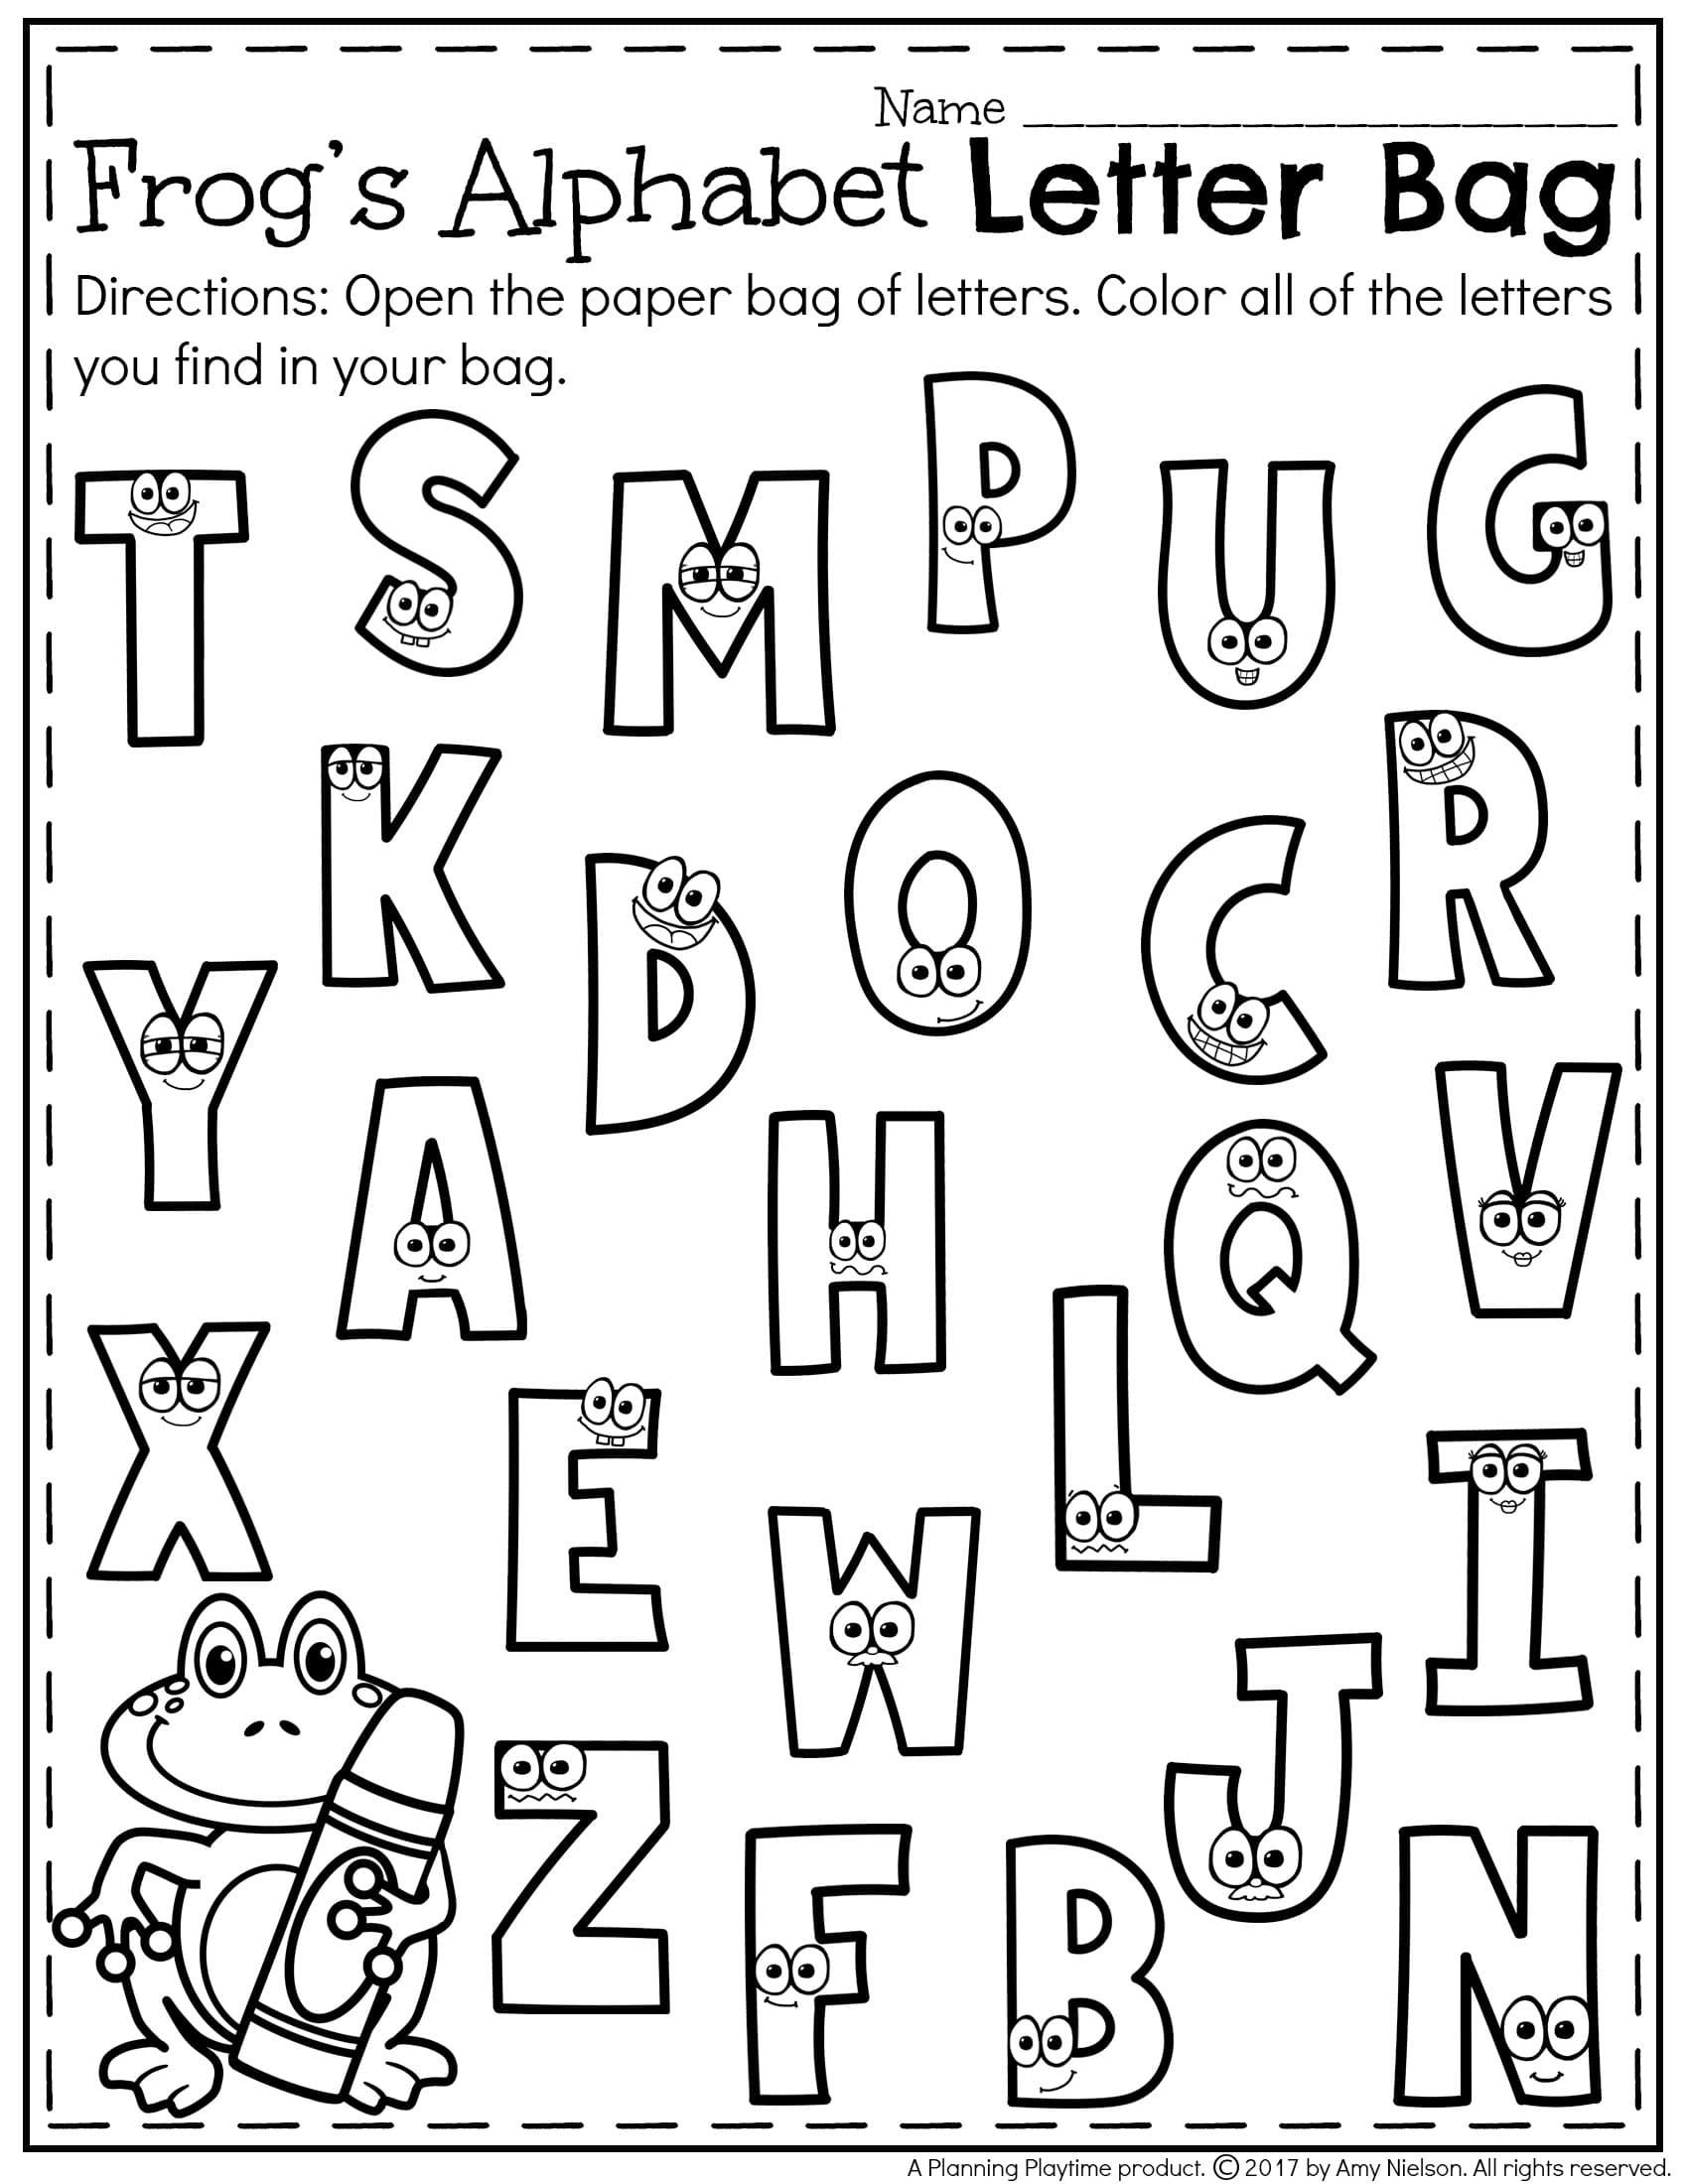 Printables Preschool Recognition Kindergarten Letter Games pertaining to Alphabet Recognition Worksheets Printable